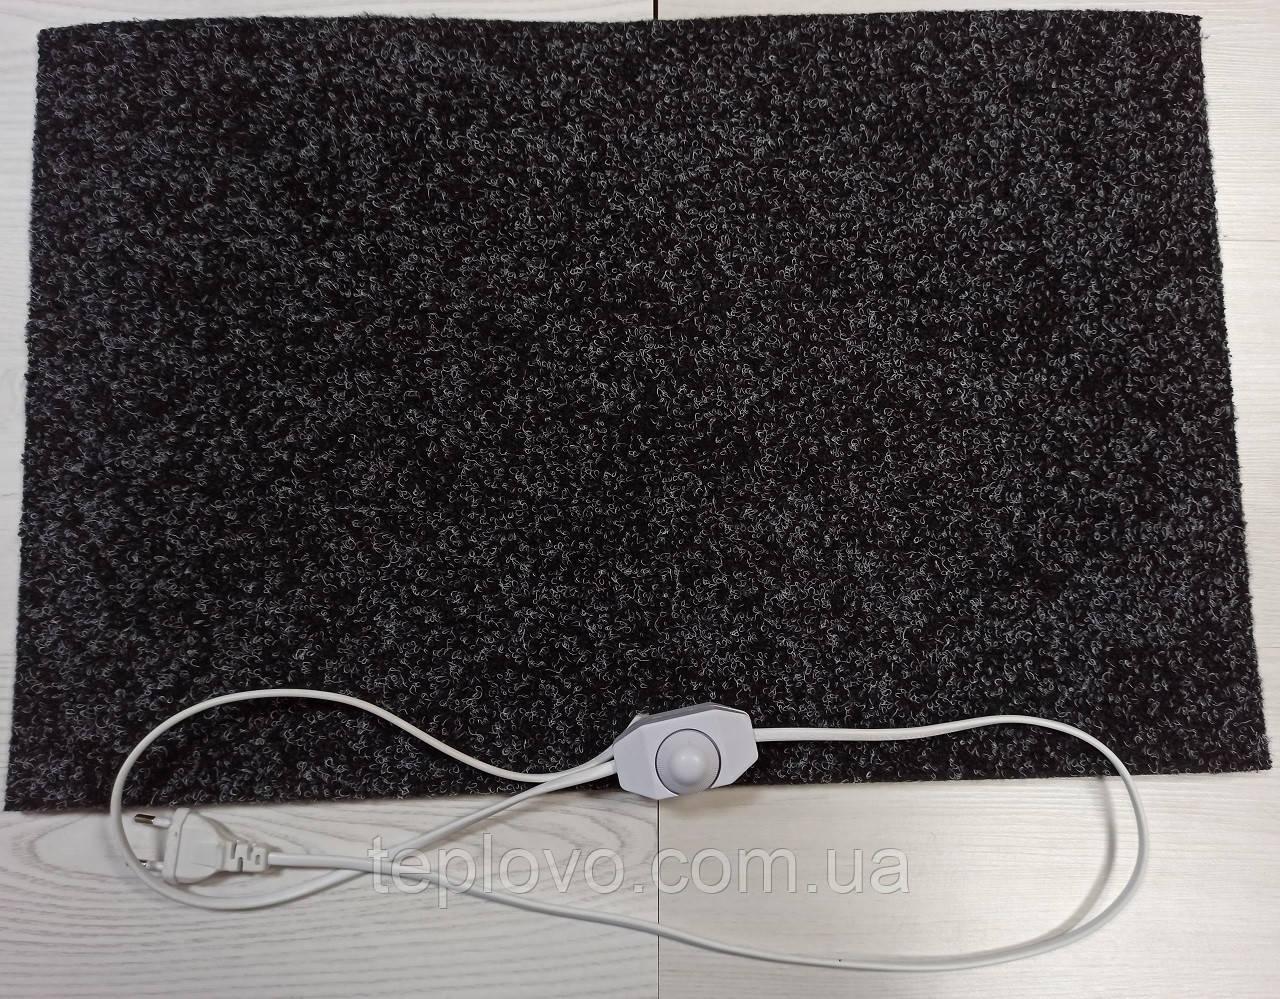 Электрический коврик с подогревом, 55х55 см, с регулятором